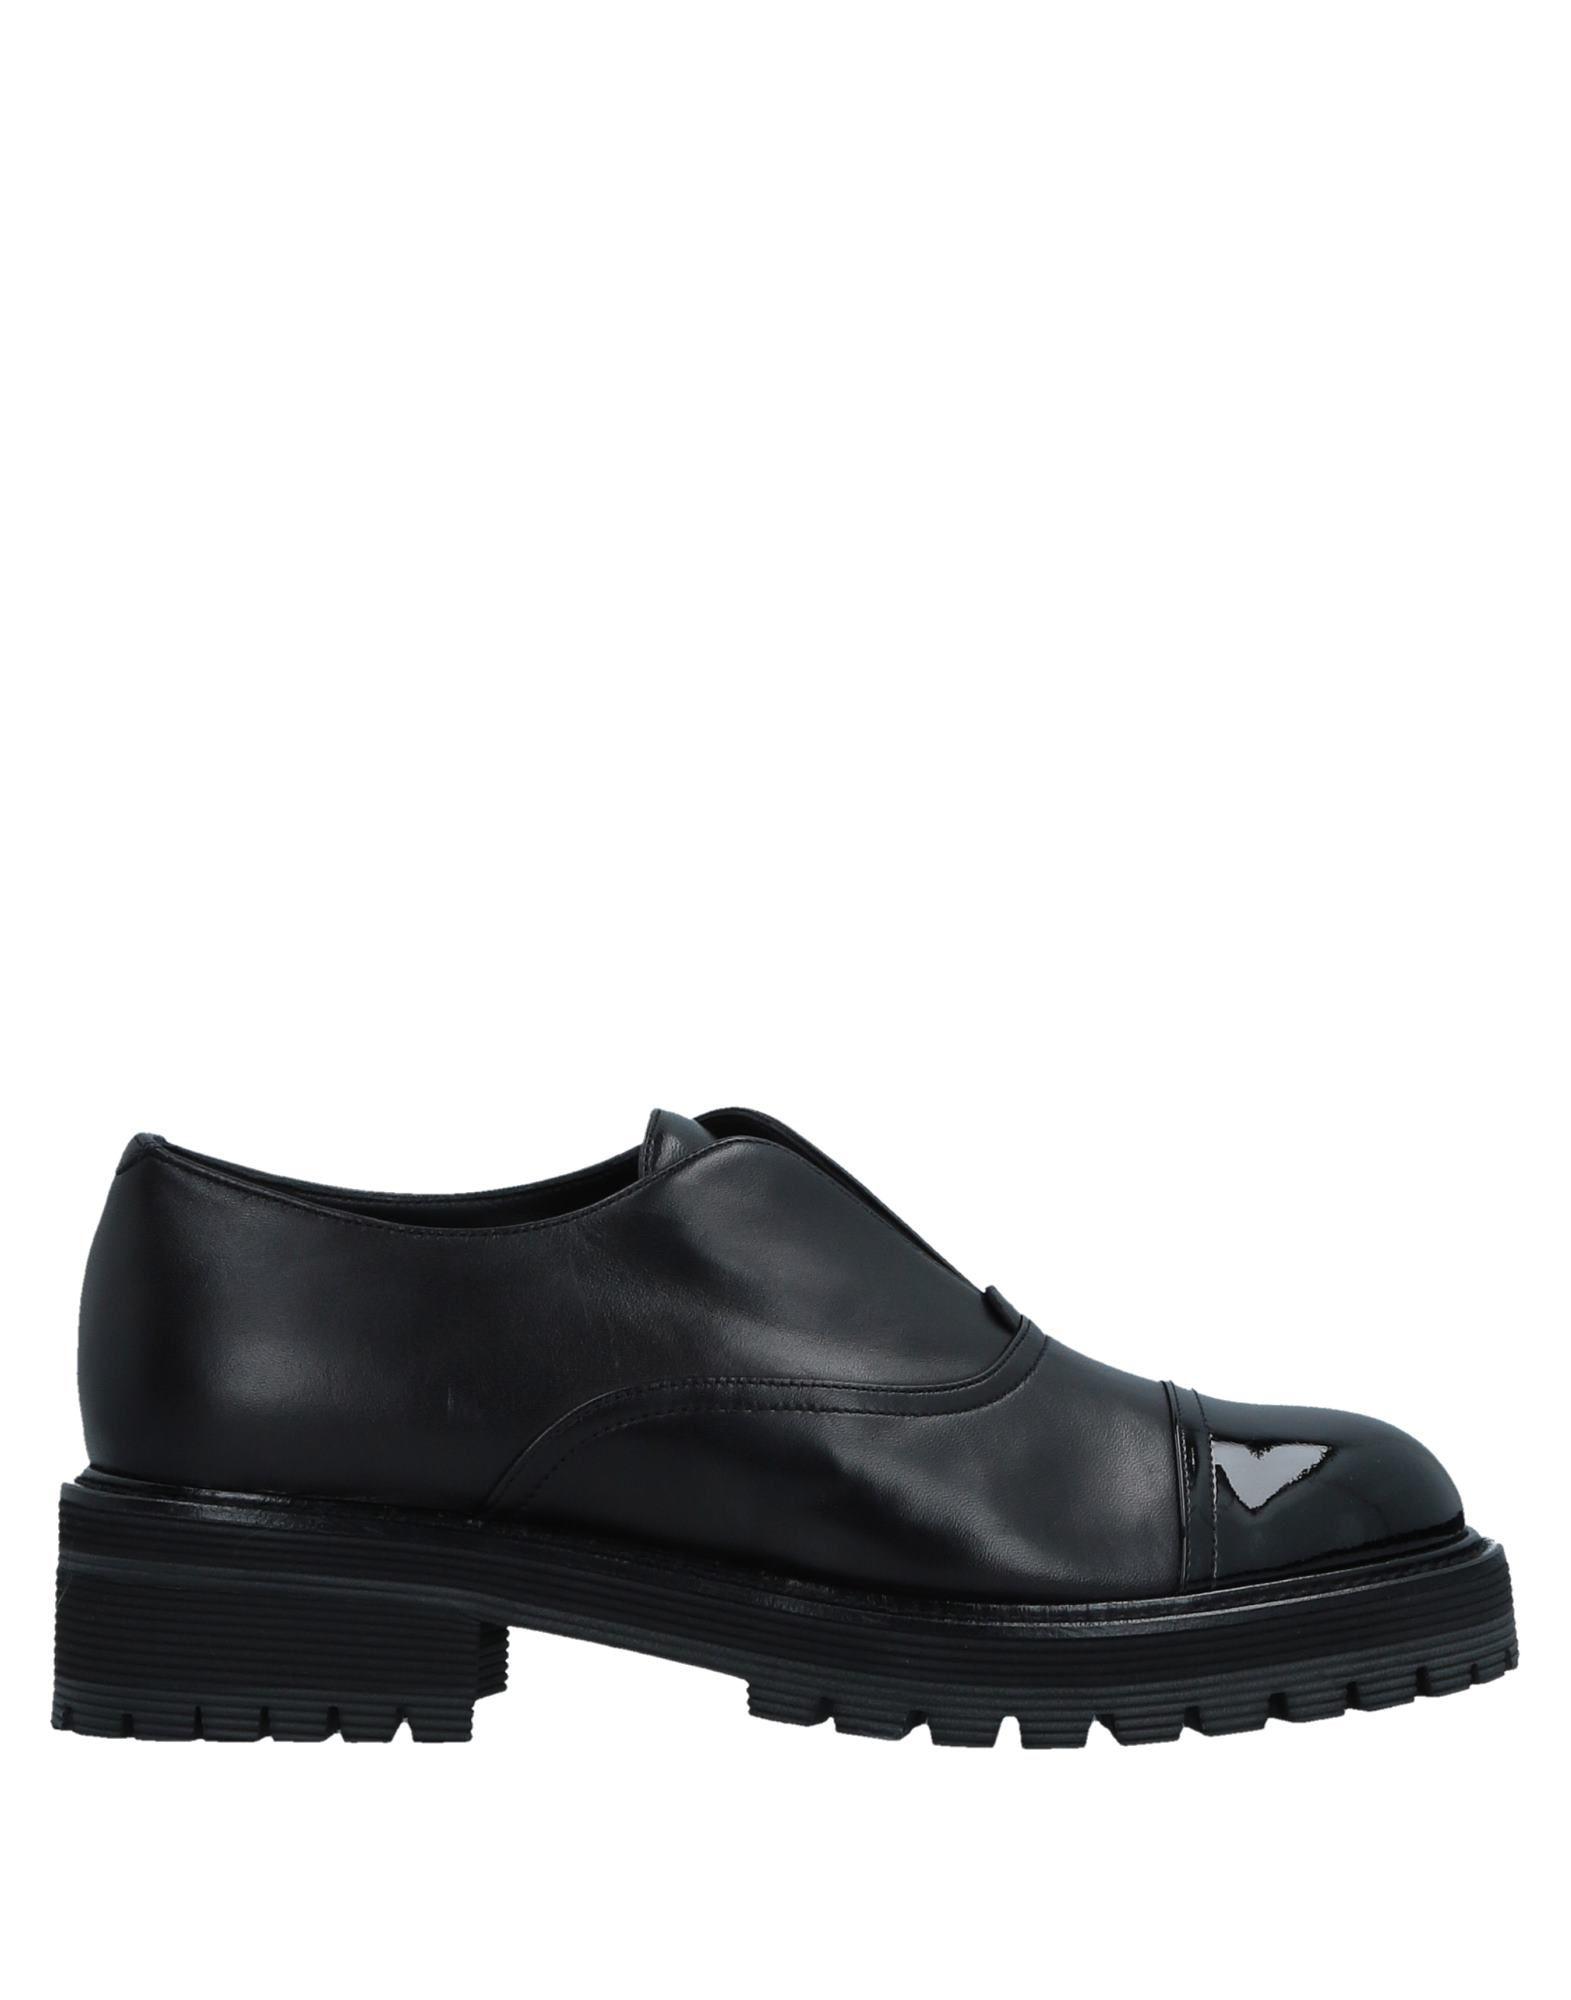 Rabatt Schuhe Giuseppe Zanotti Mokassins Damen  11523016SN